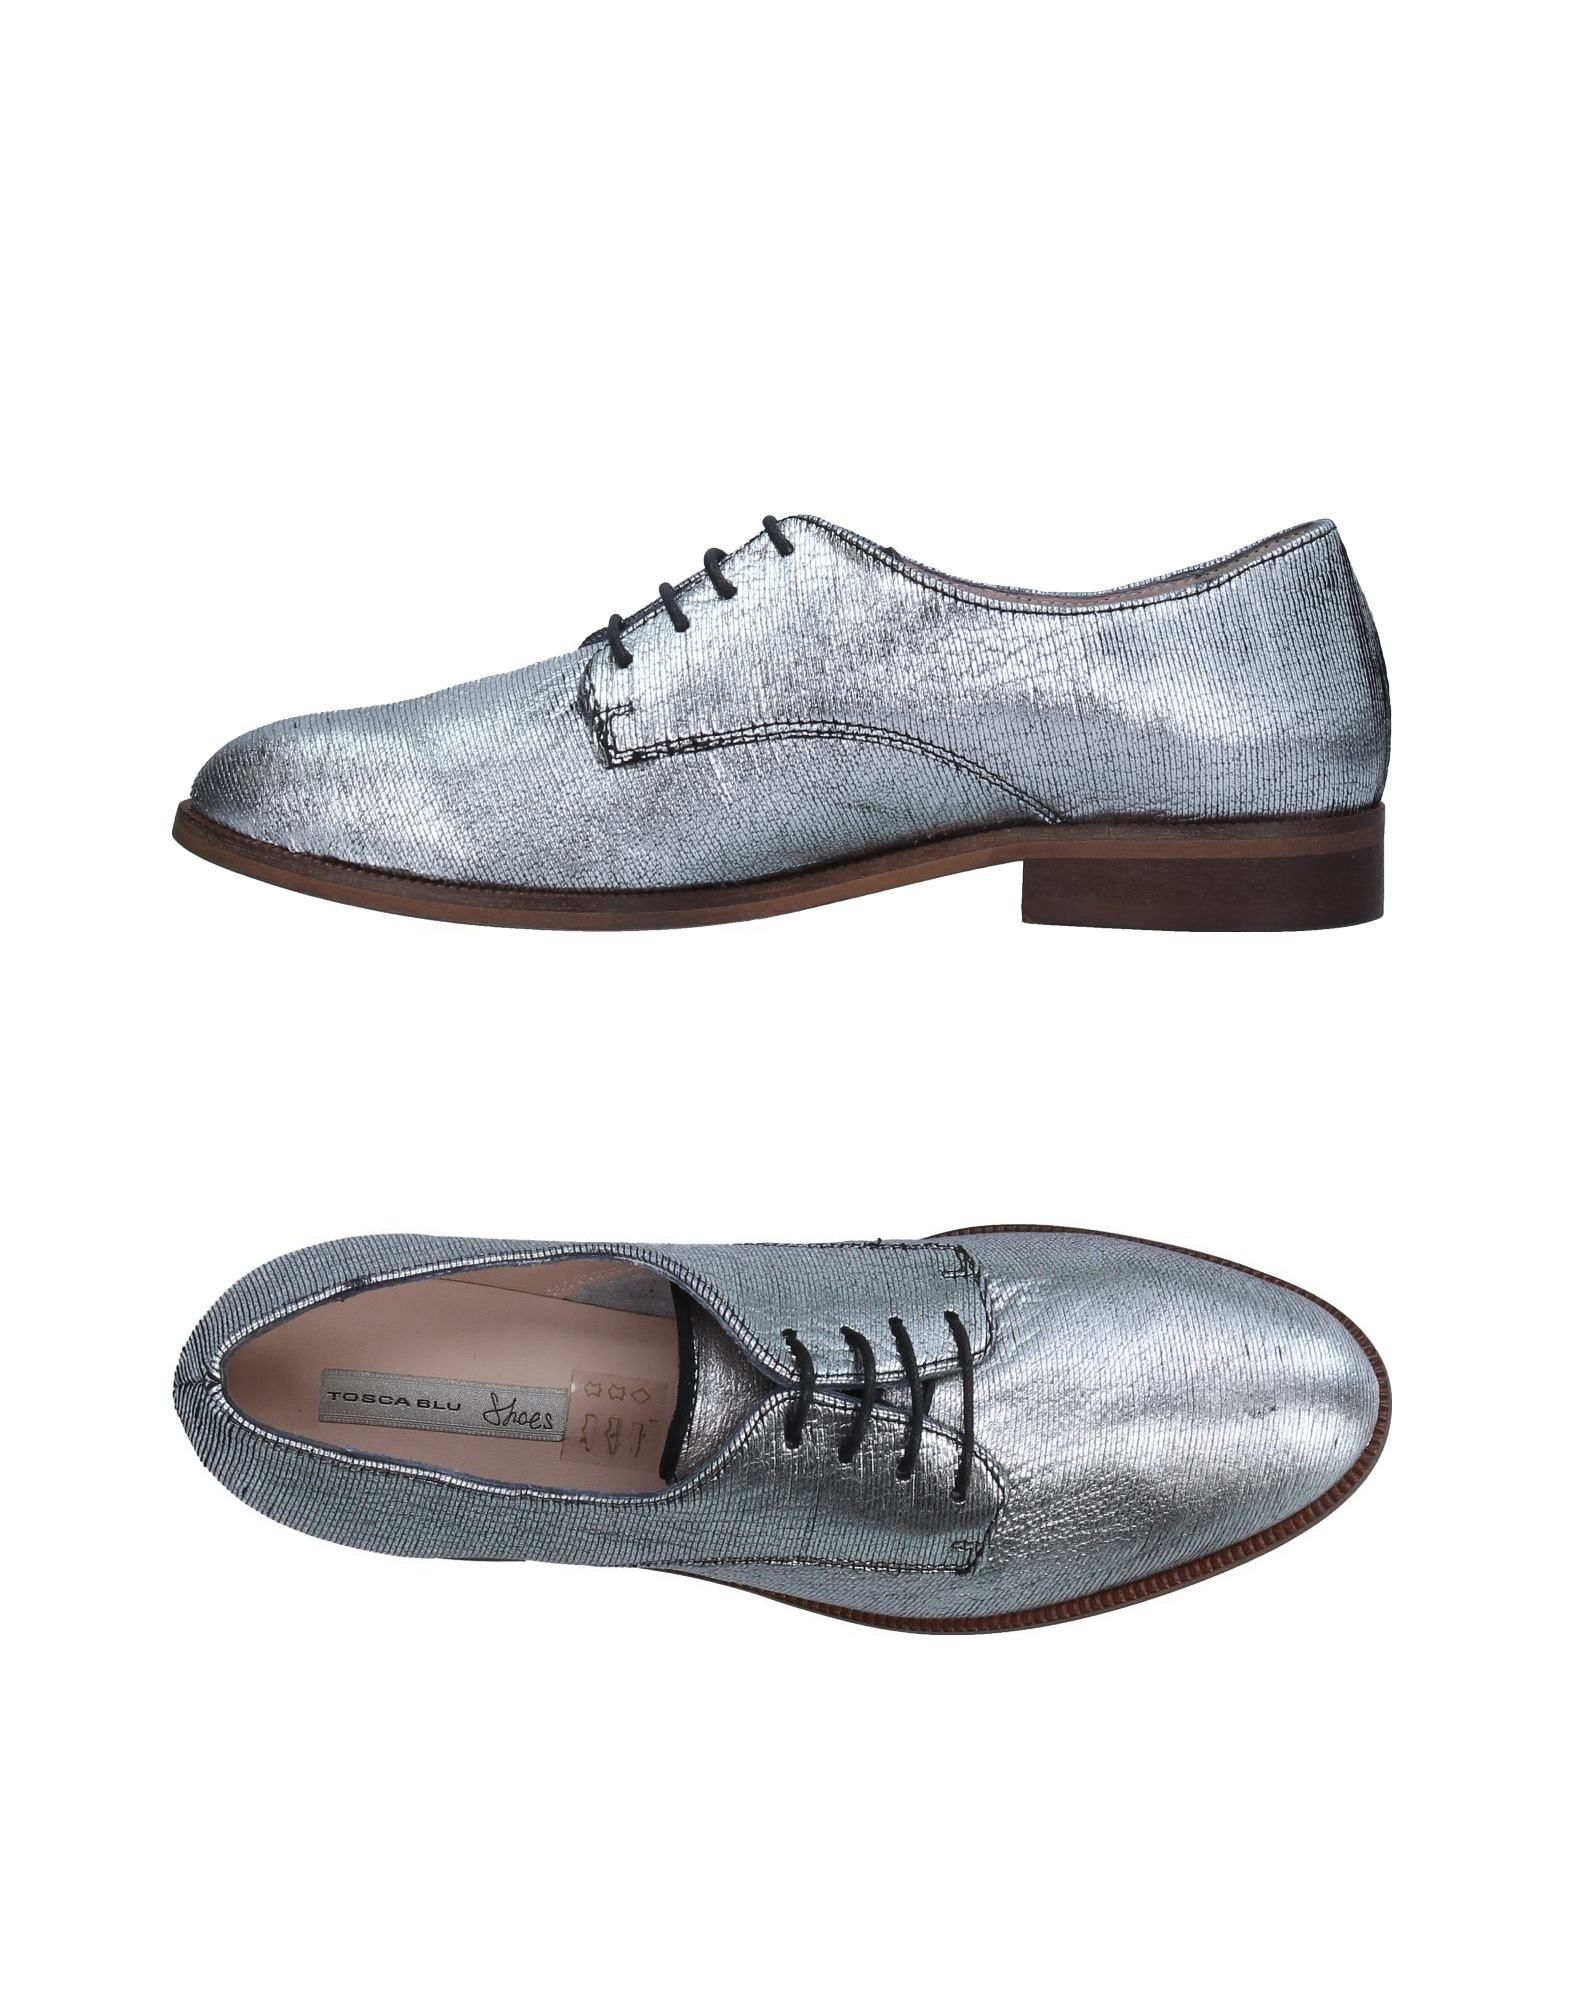 TOSCA BLU SHOES Обувь на шнурках цены онлайн